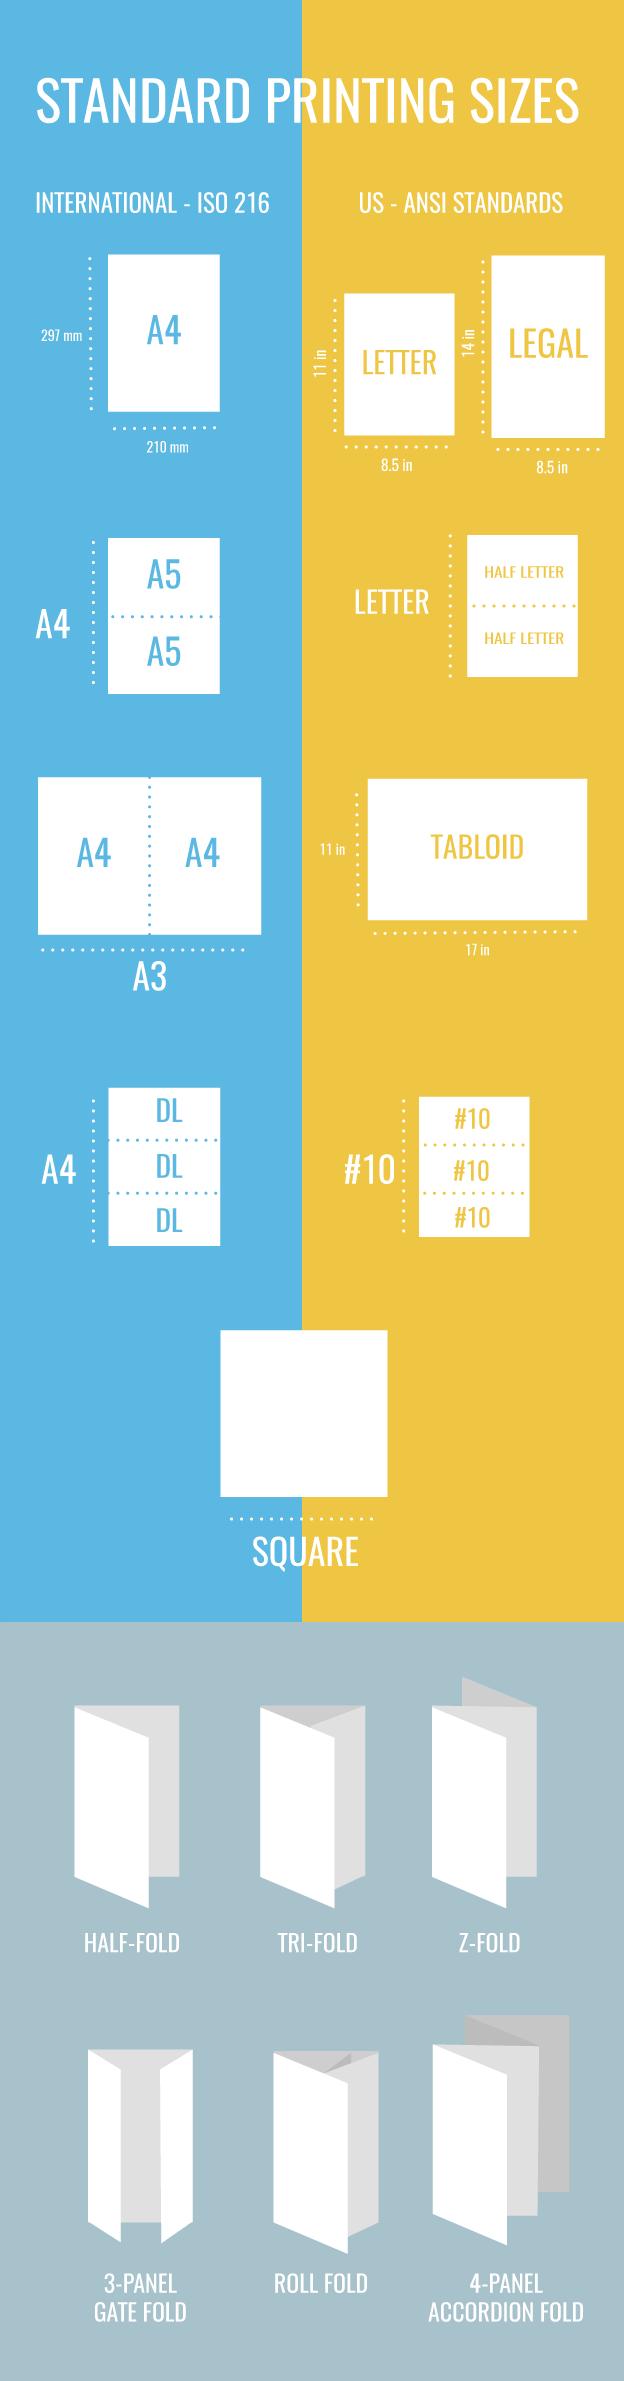 standard brochure sizes for